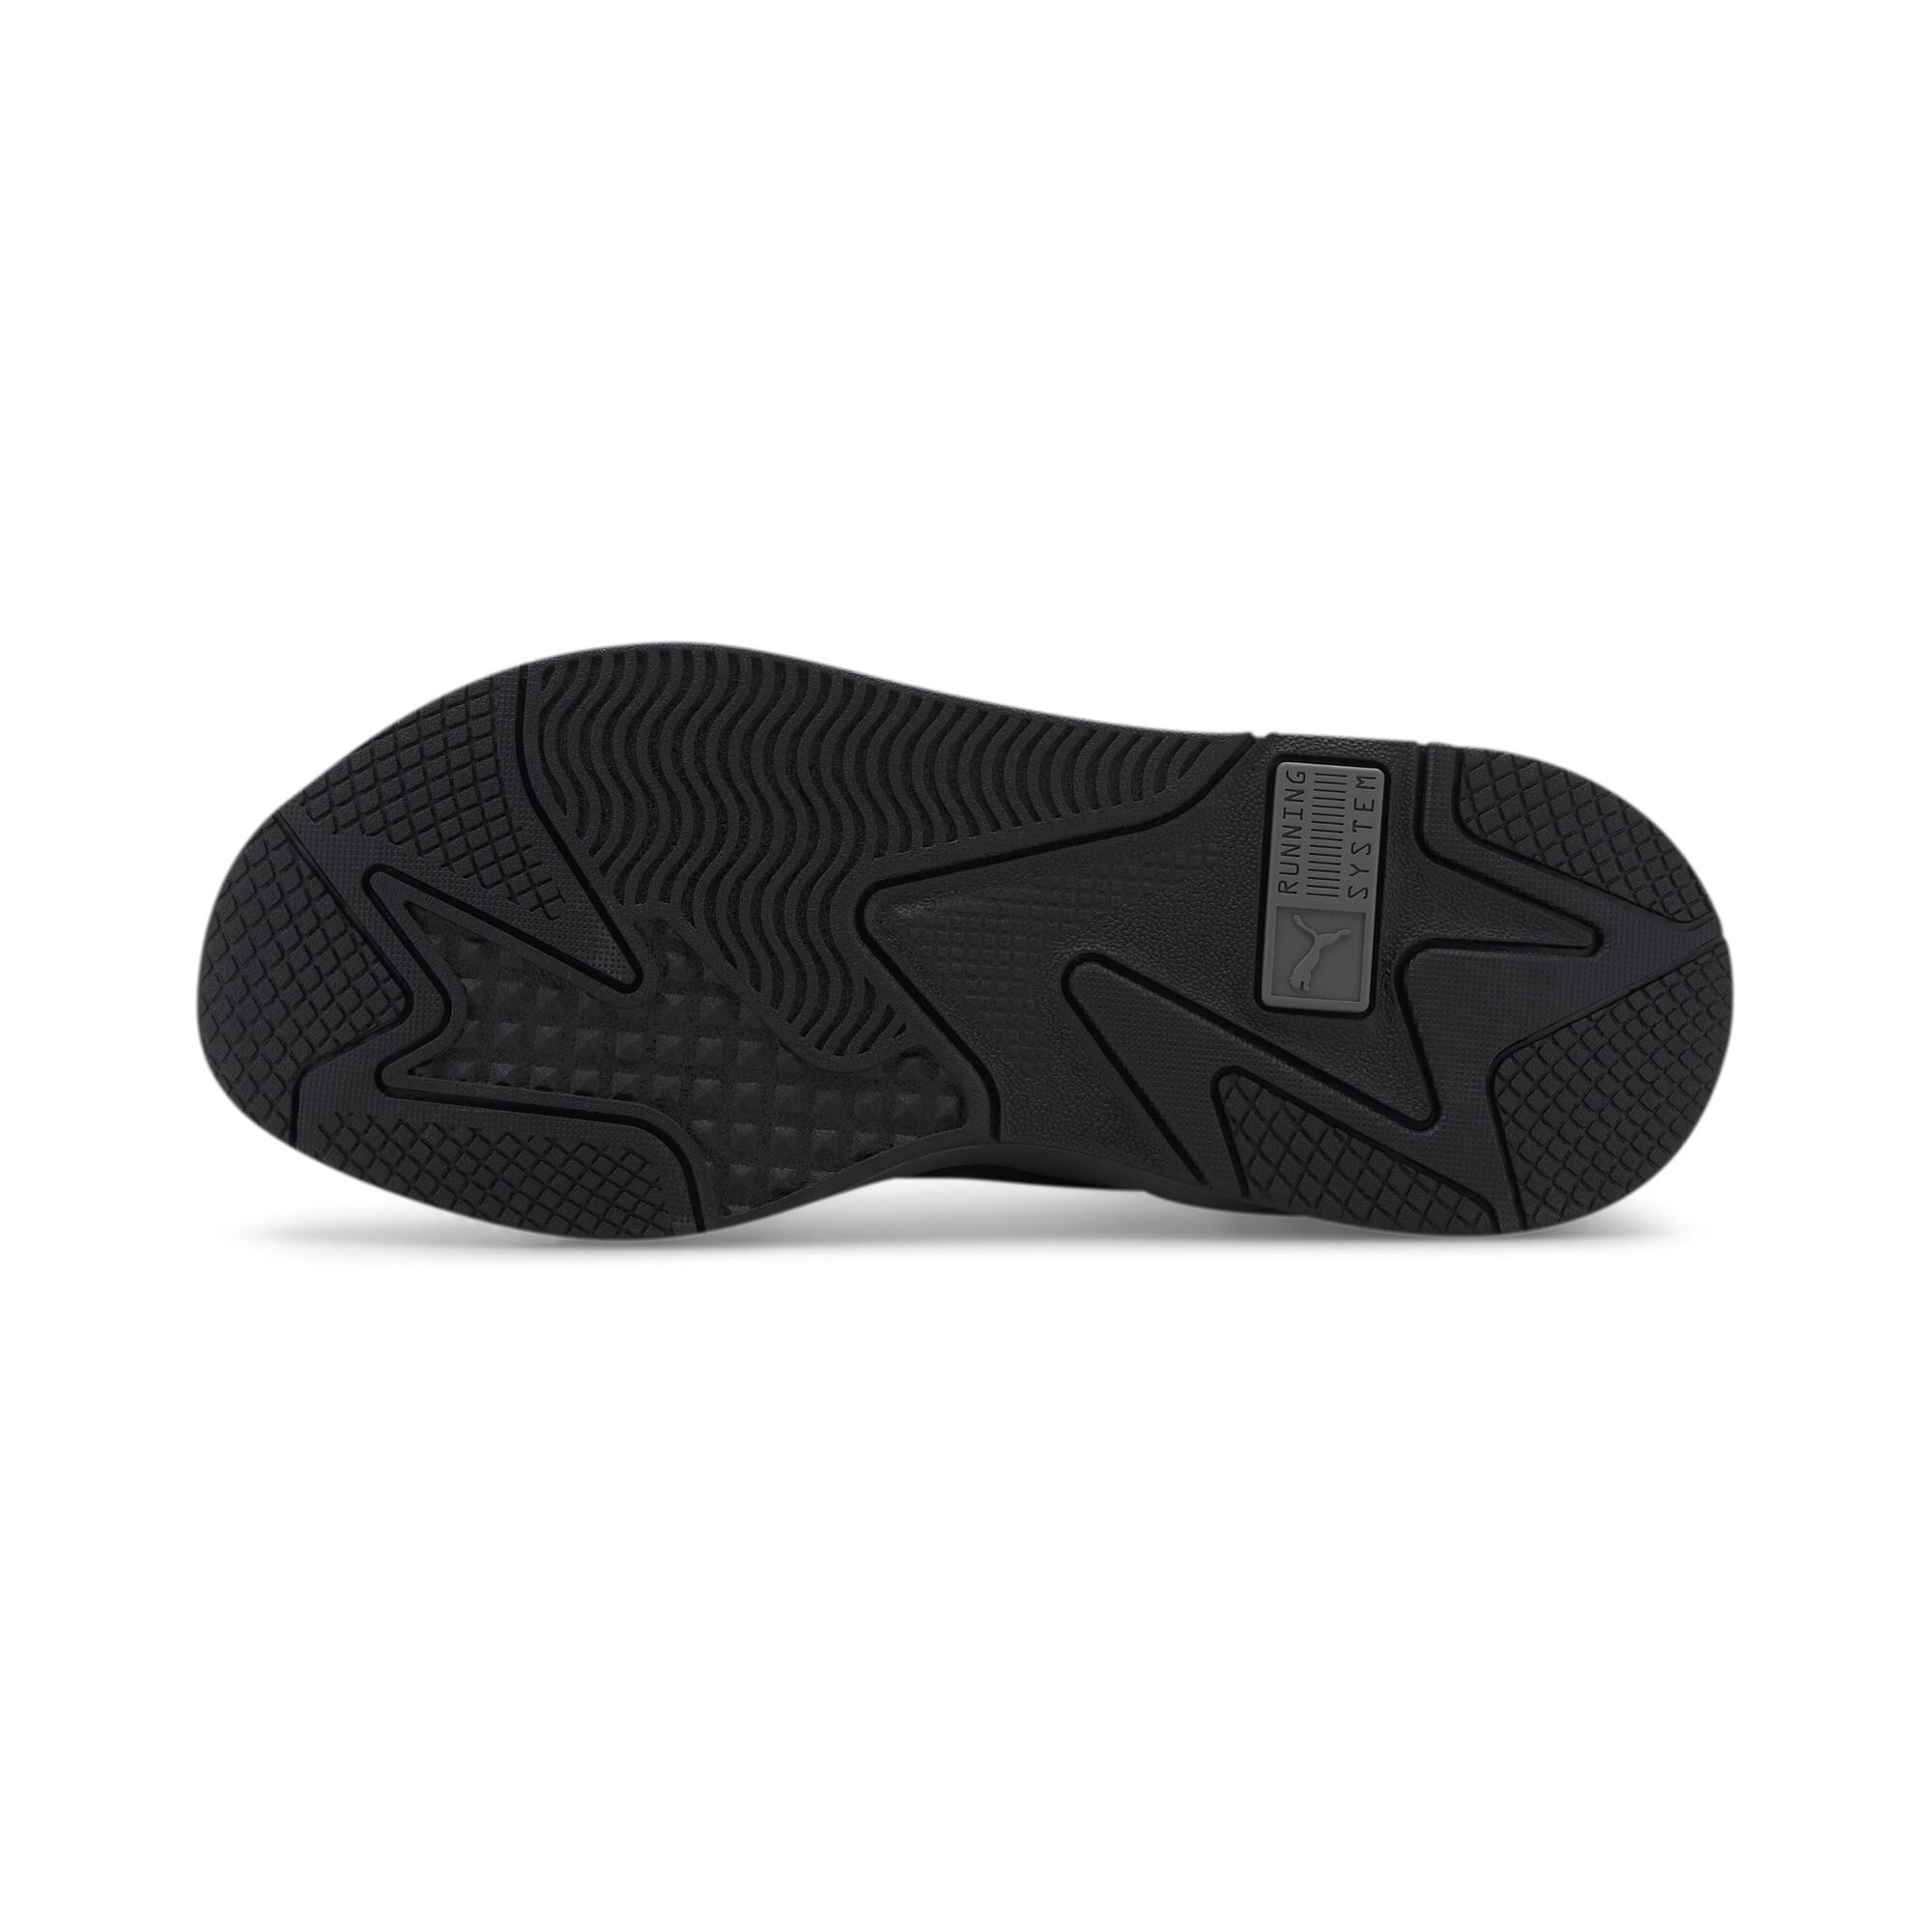 PUMA-Men-039-s-RS-X-Puzzle-Sneakers thumbnail 25